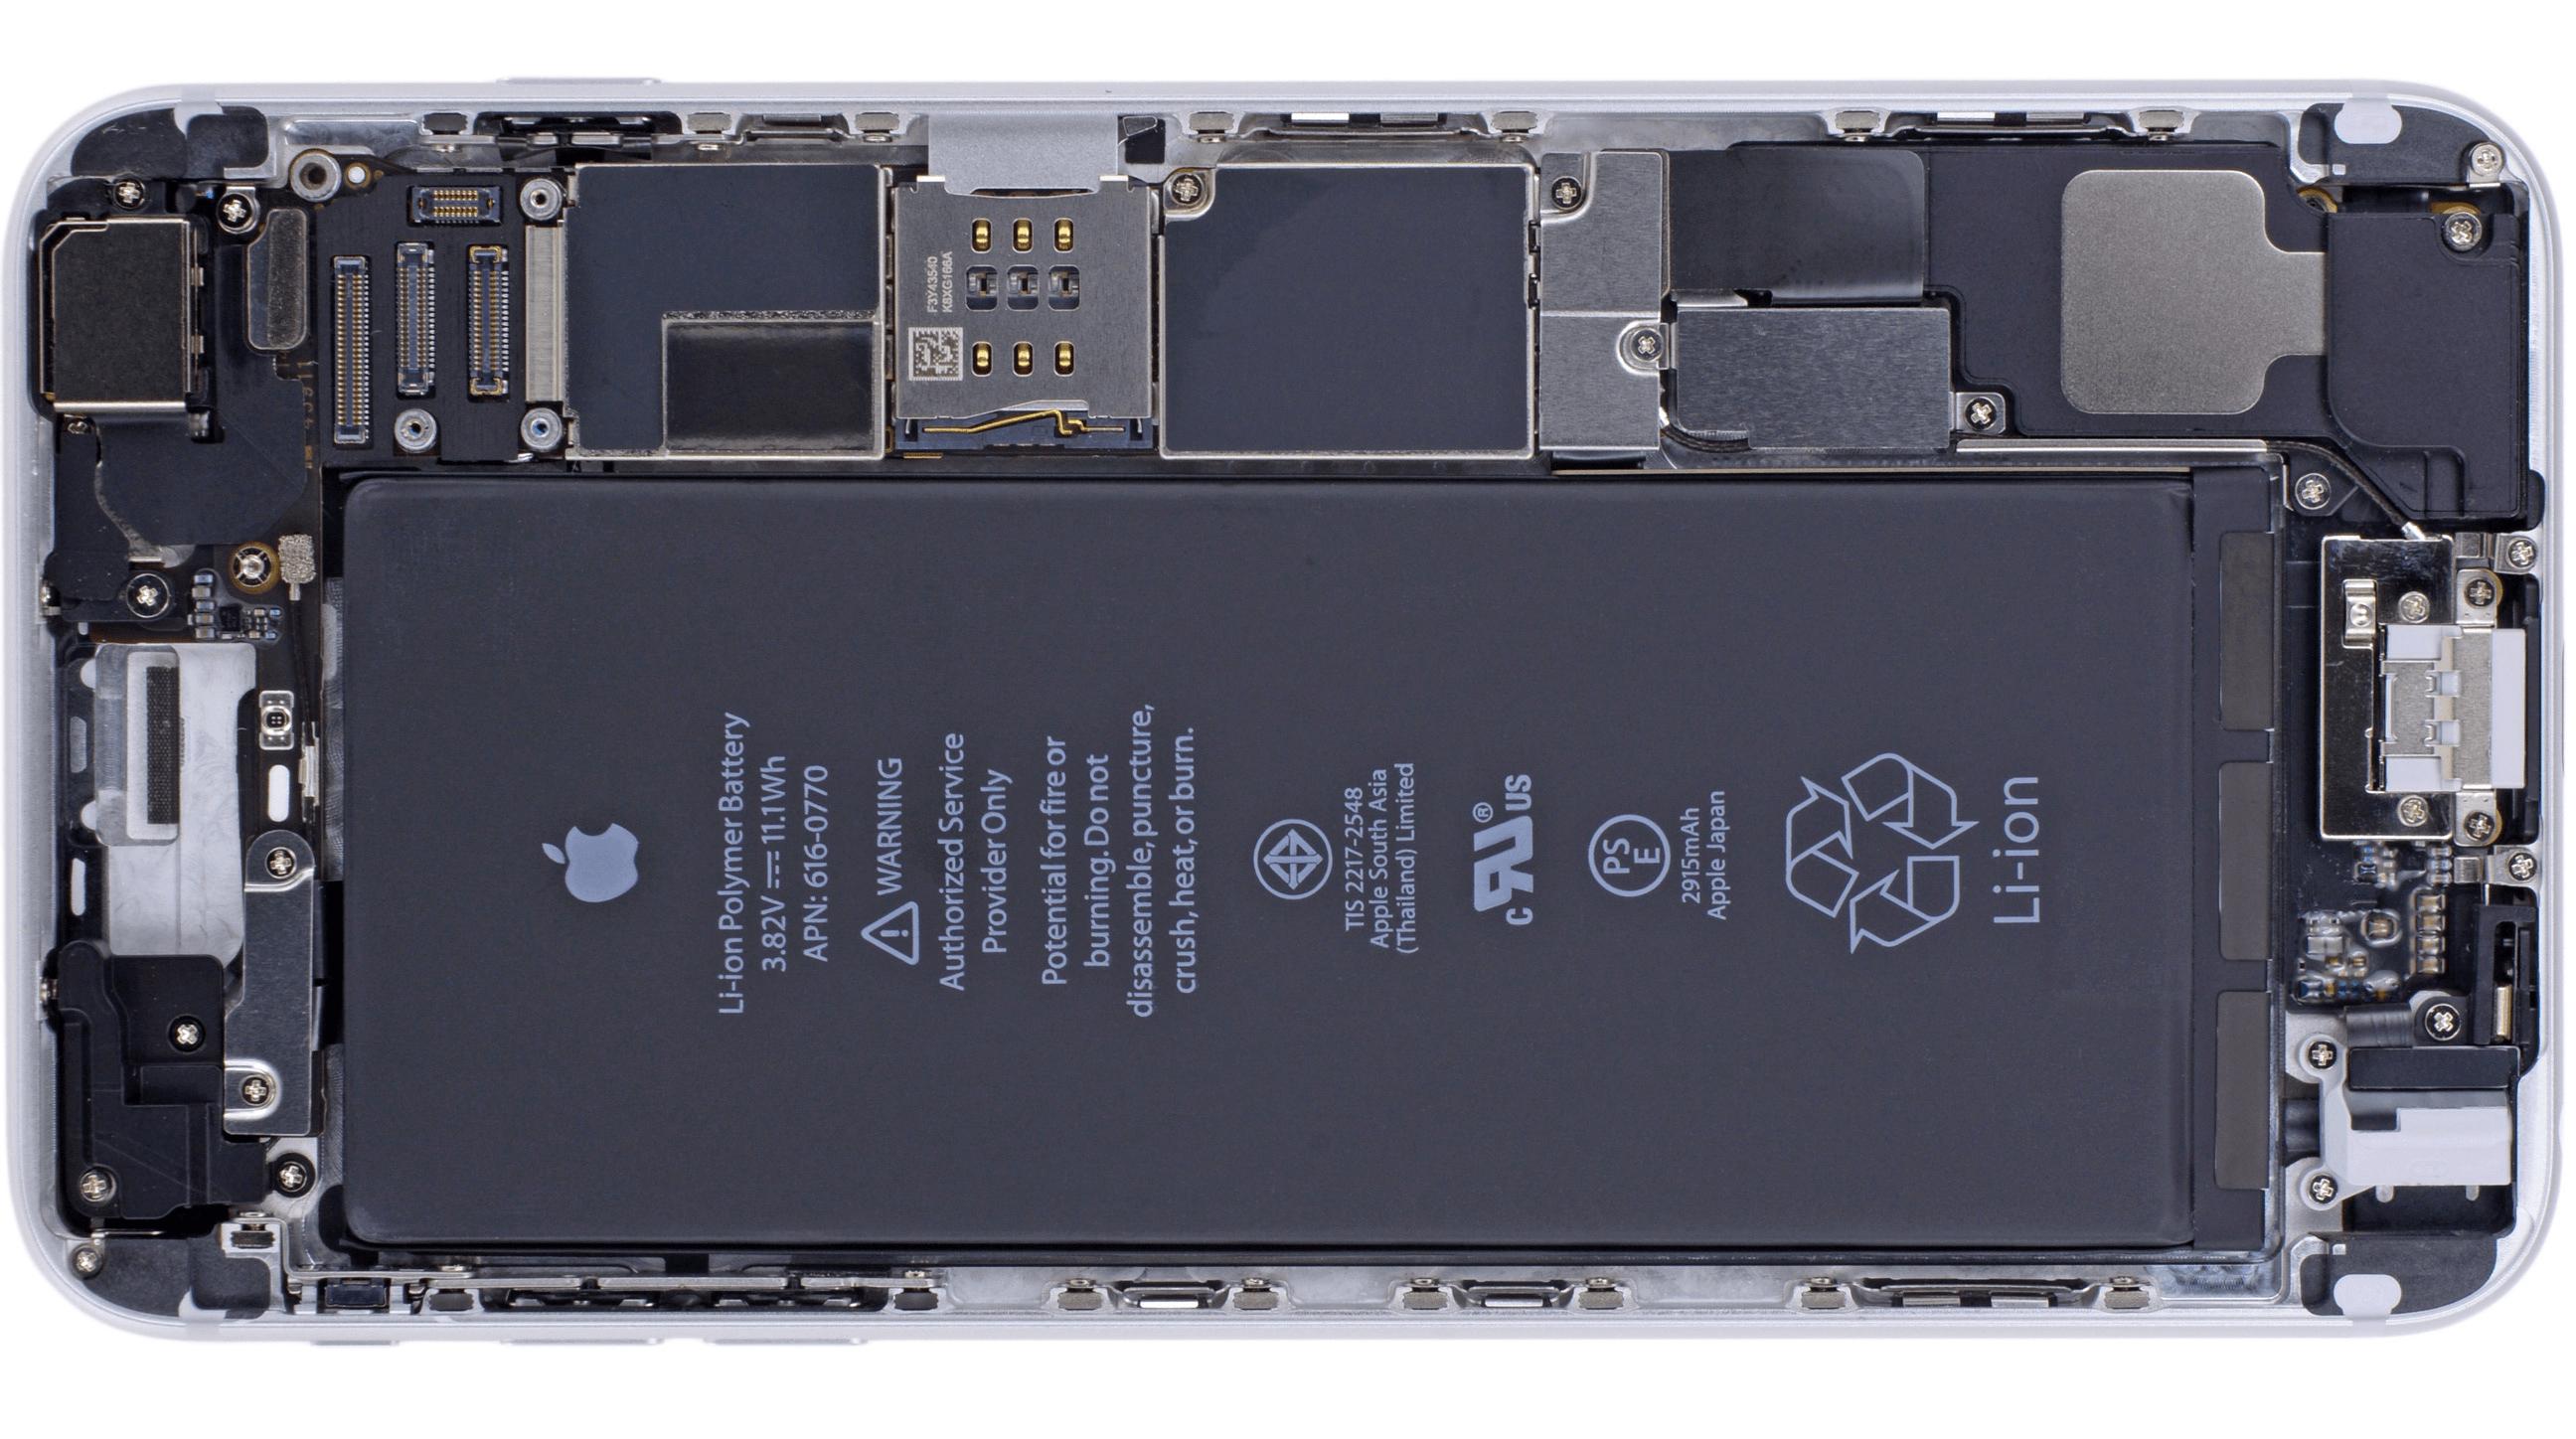 Wallpaper componente interne iPhone 6